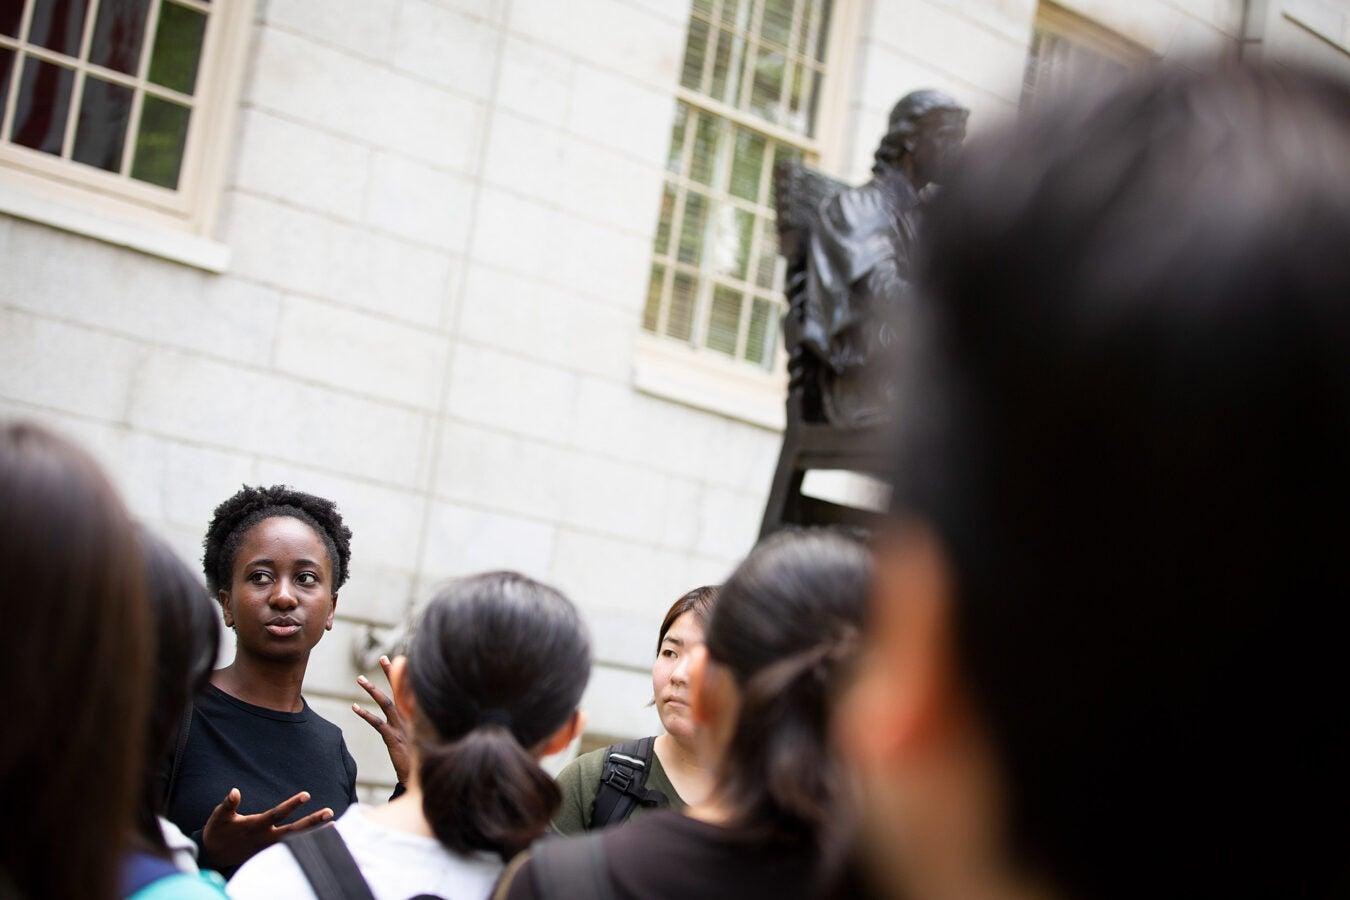 Sammota Mwakalobo leads a tour group by the statue.